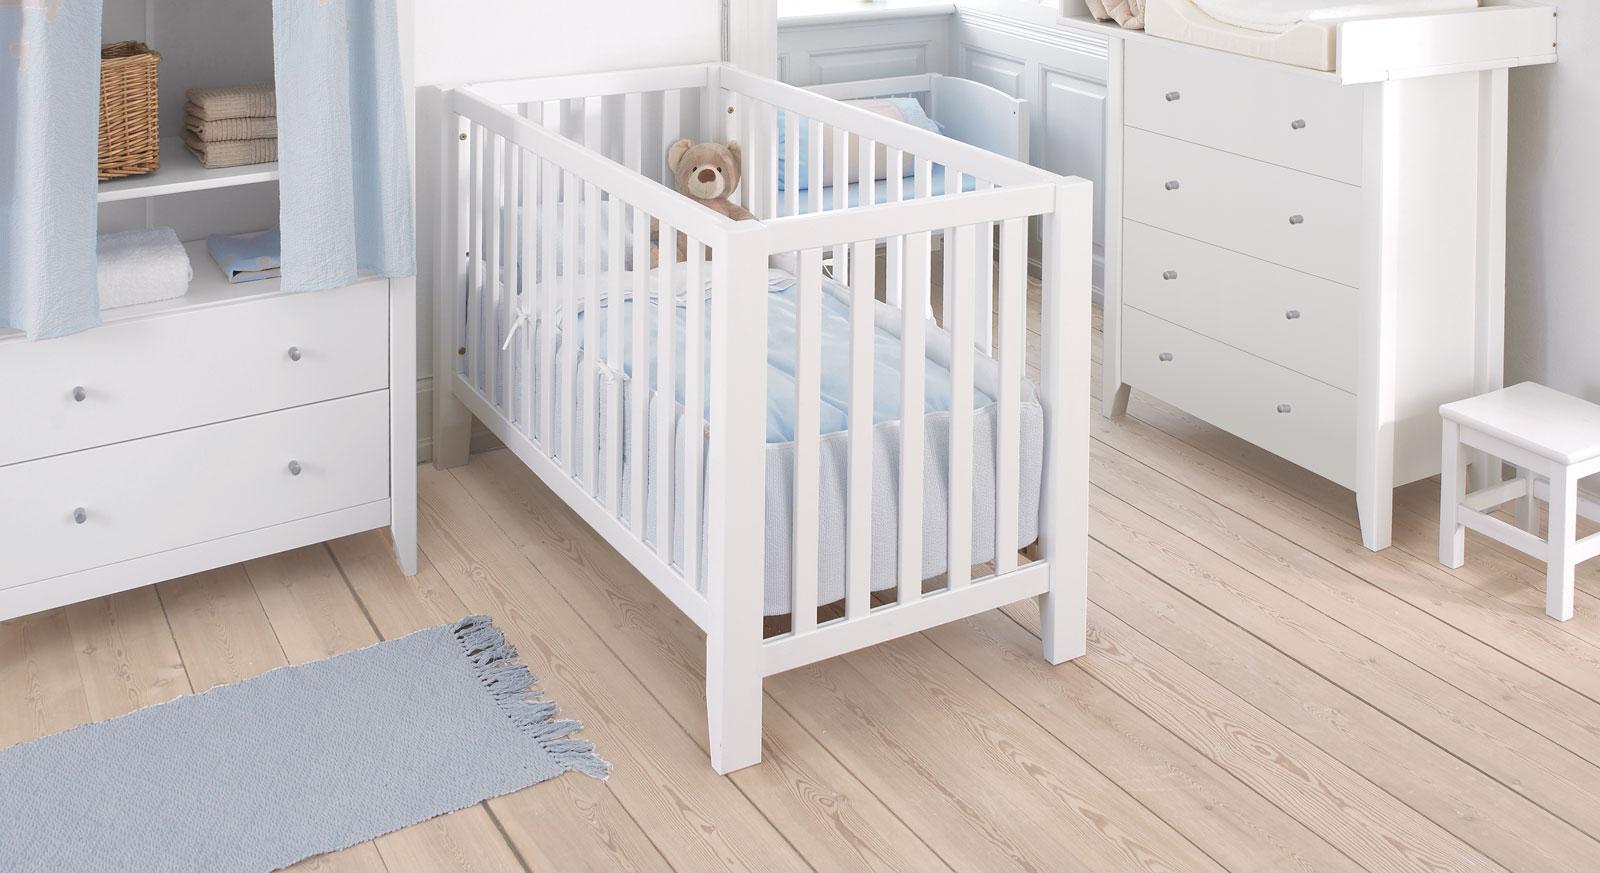 Atemberaubend Kinderbett Metallrahmen Galerie - Rahmen Ideen ...